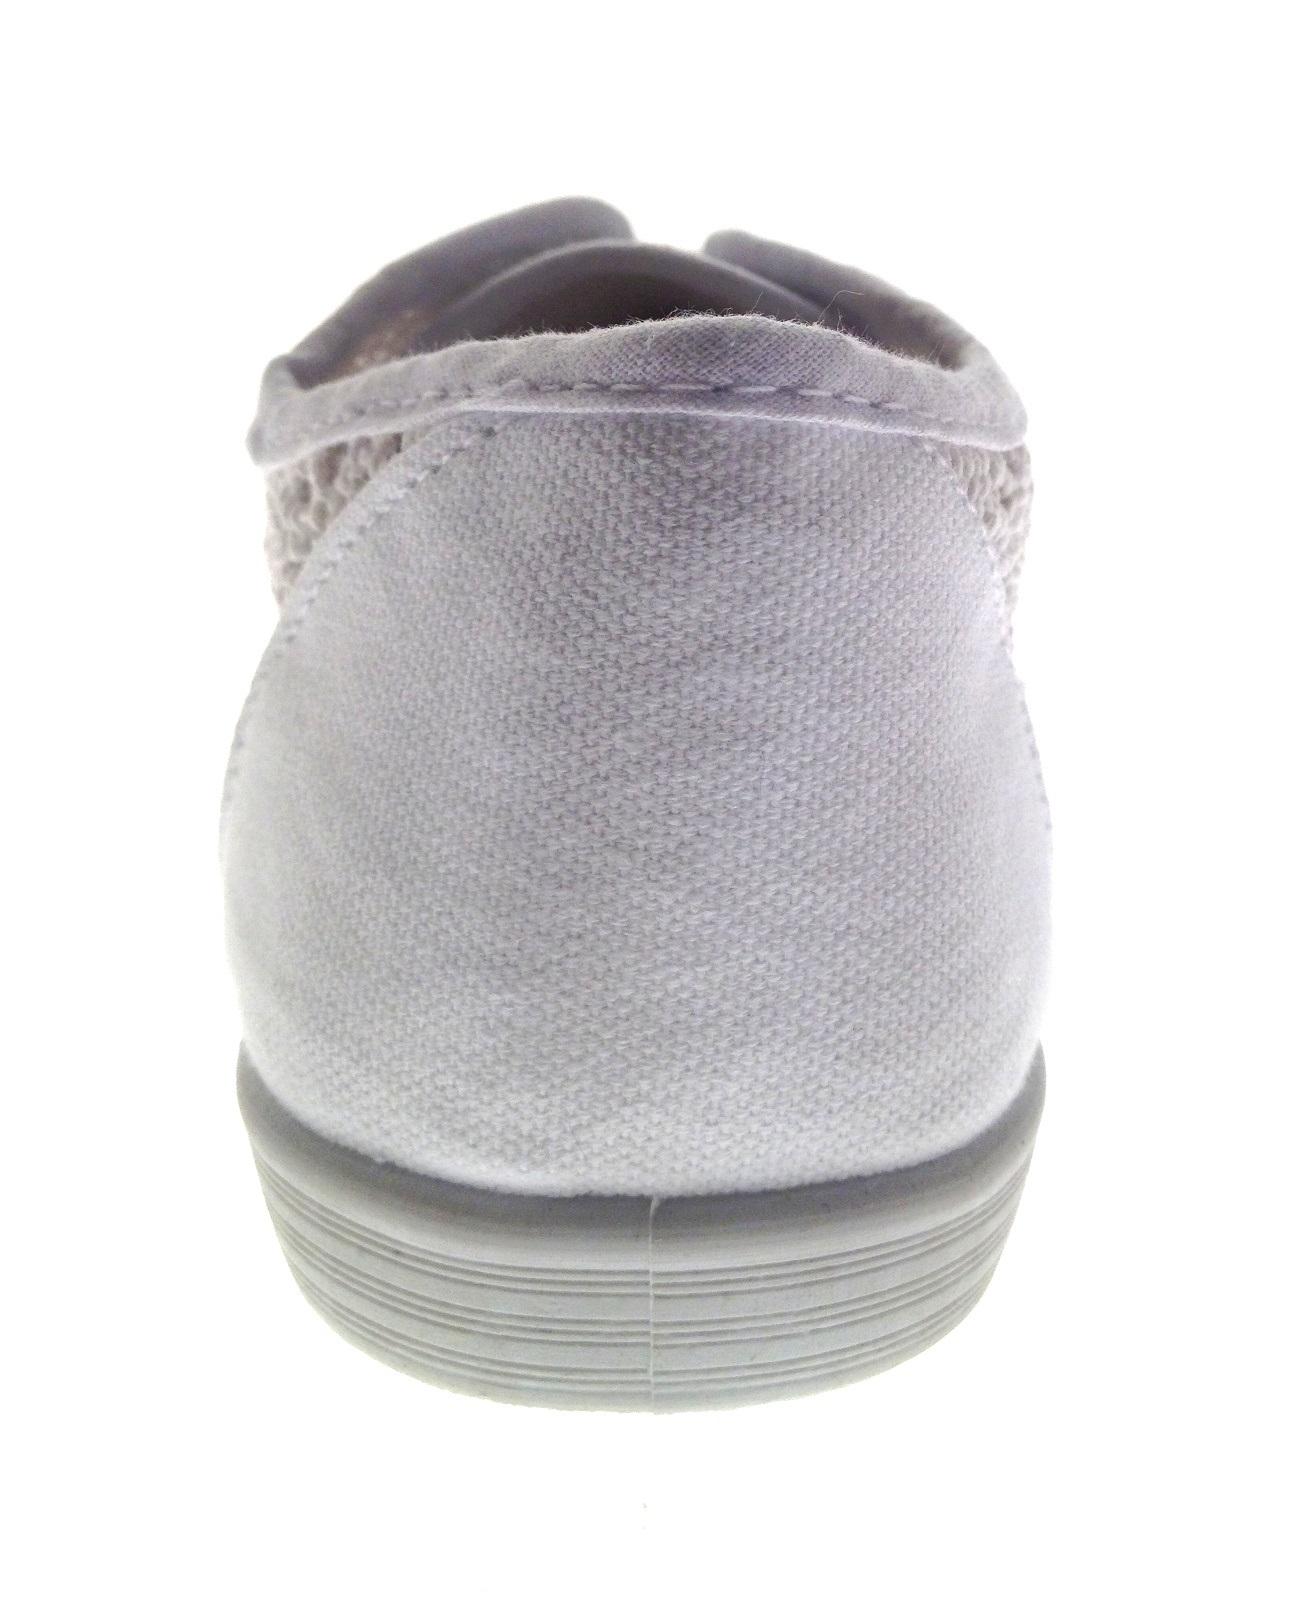 Da Donna Tela Lacci Pompe Crochet Scarpe da ginnastica donna UK 3-8